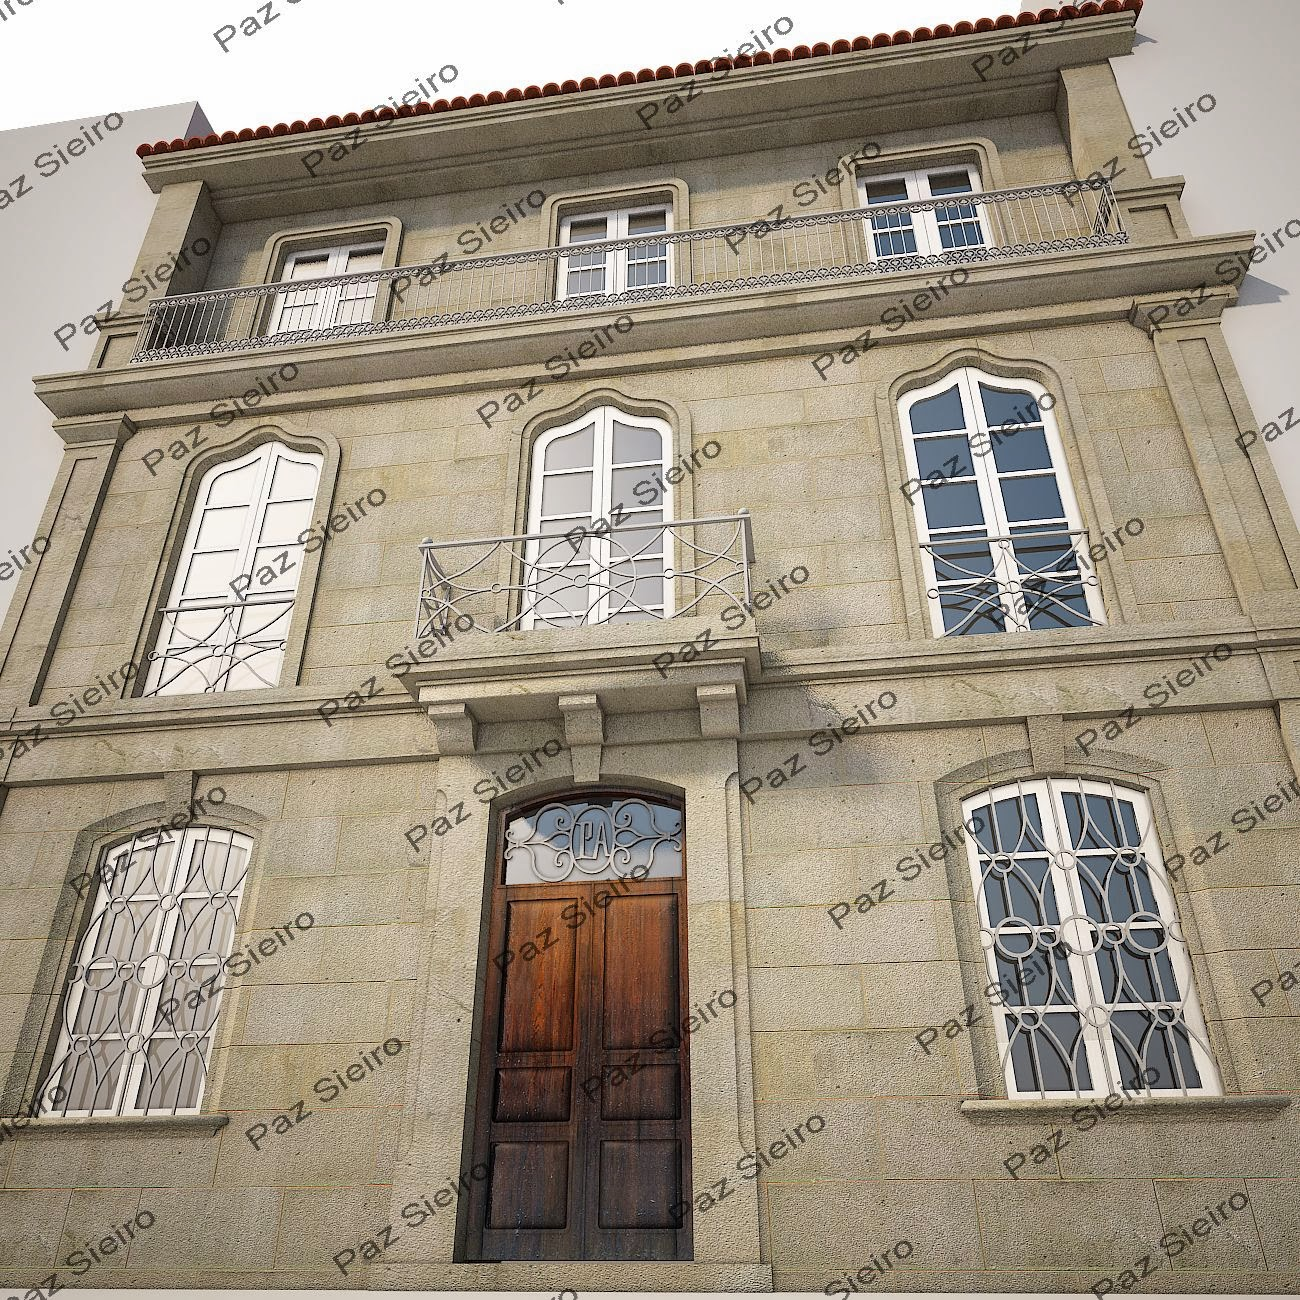 Casa dos paules 1880 r a alva actual cardenal quiroga mestre de obra emilio meru ndano - Idea casa biancheria mestre ...